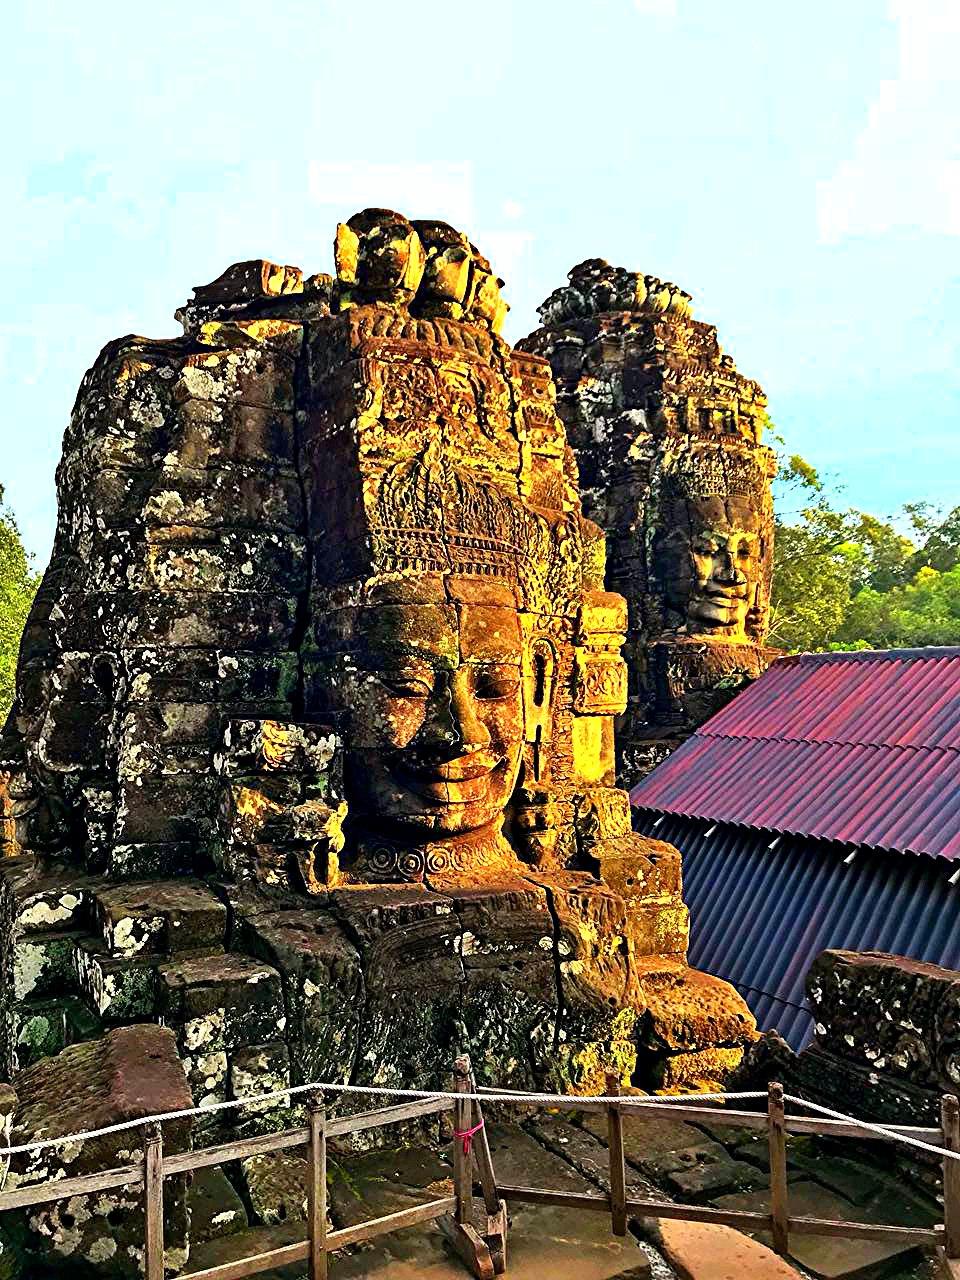 Елена Руденко (Валтея). Камбоджа. Ангкор. V-tyRaECRbA